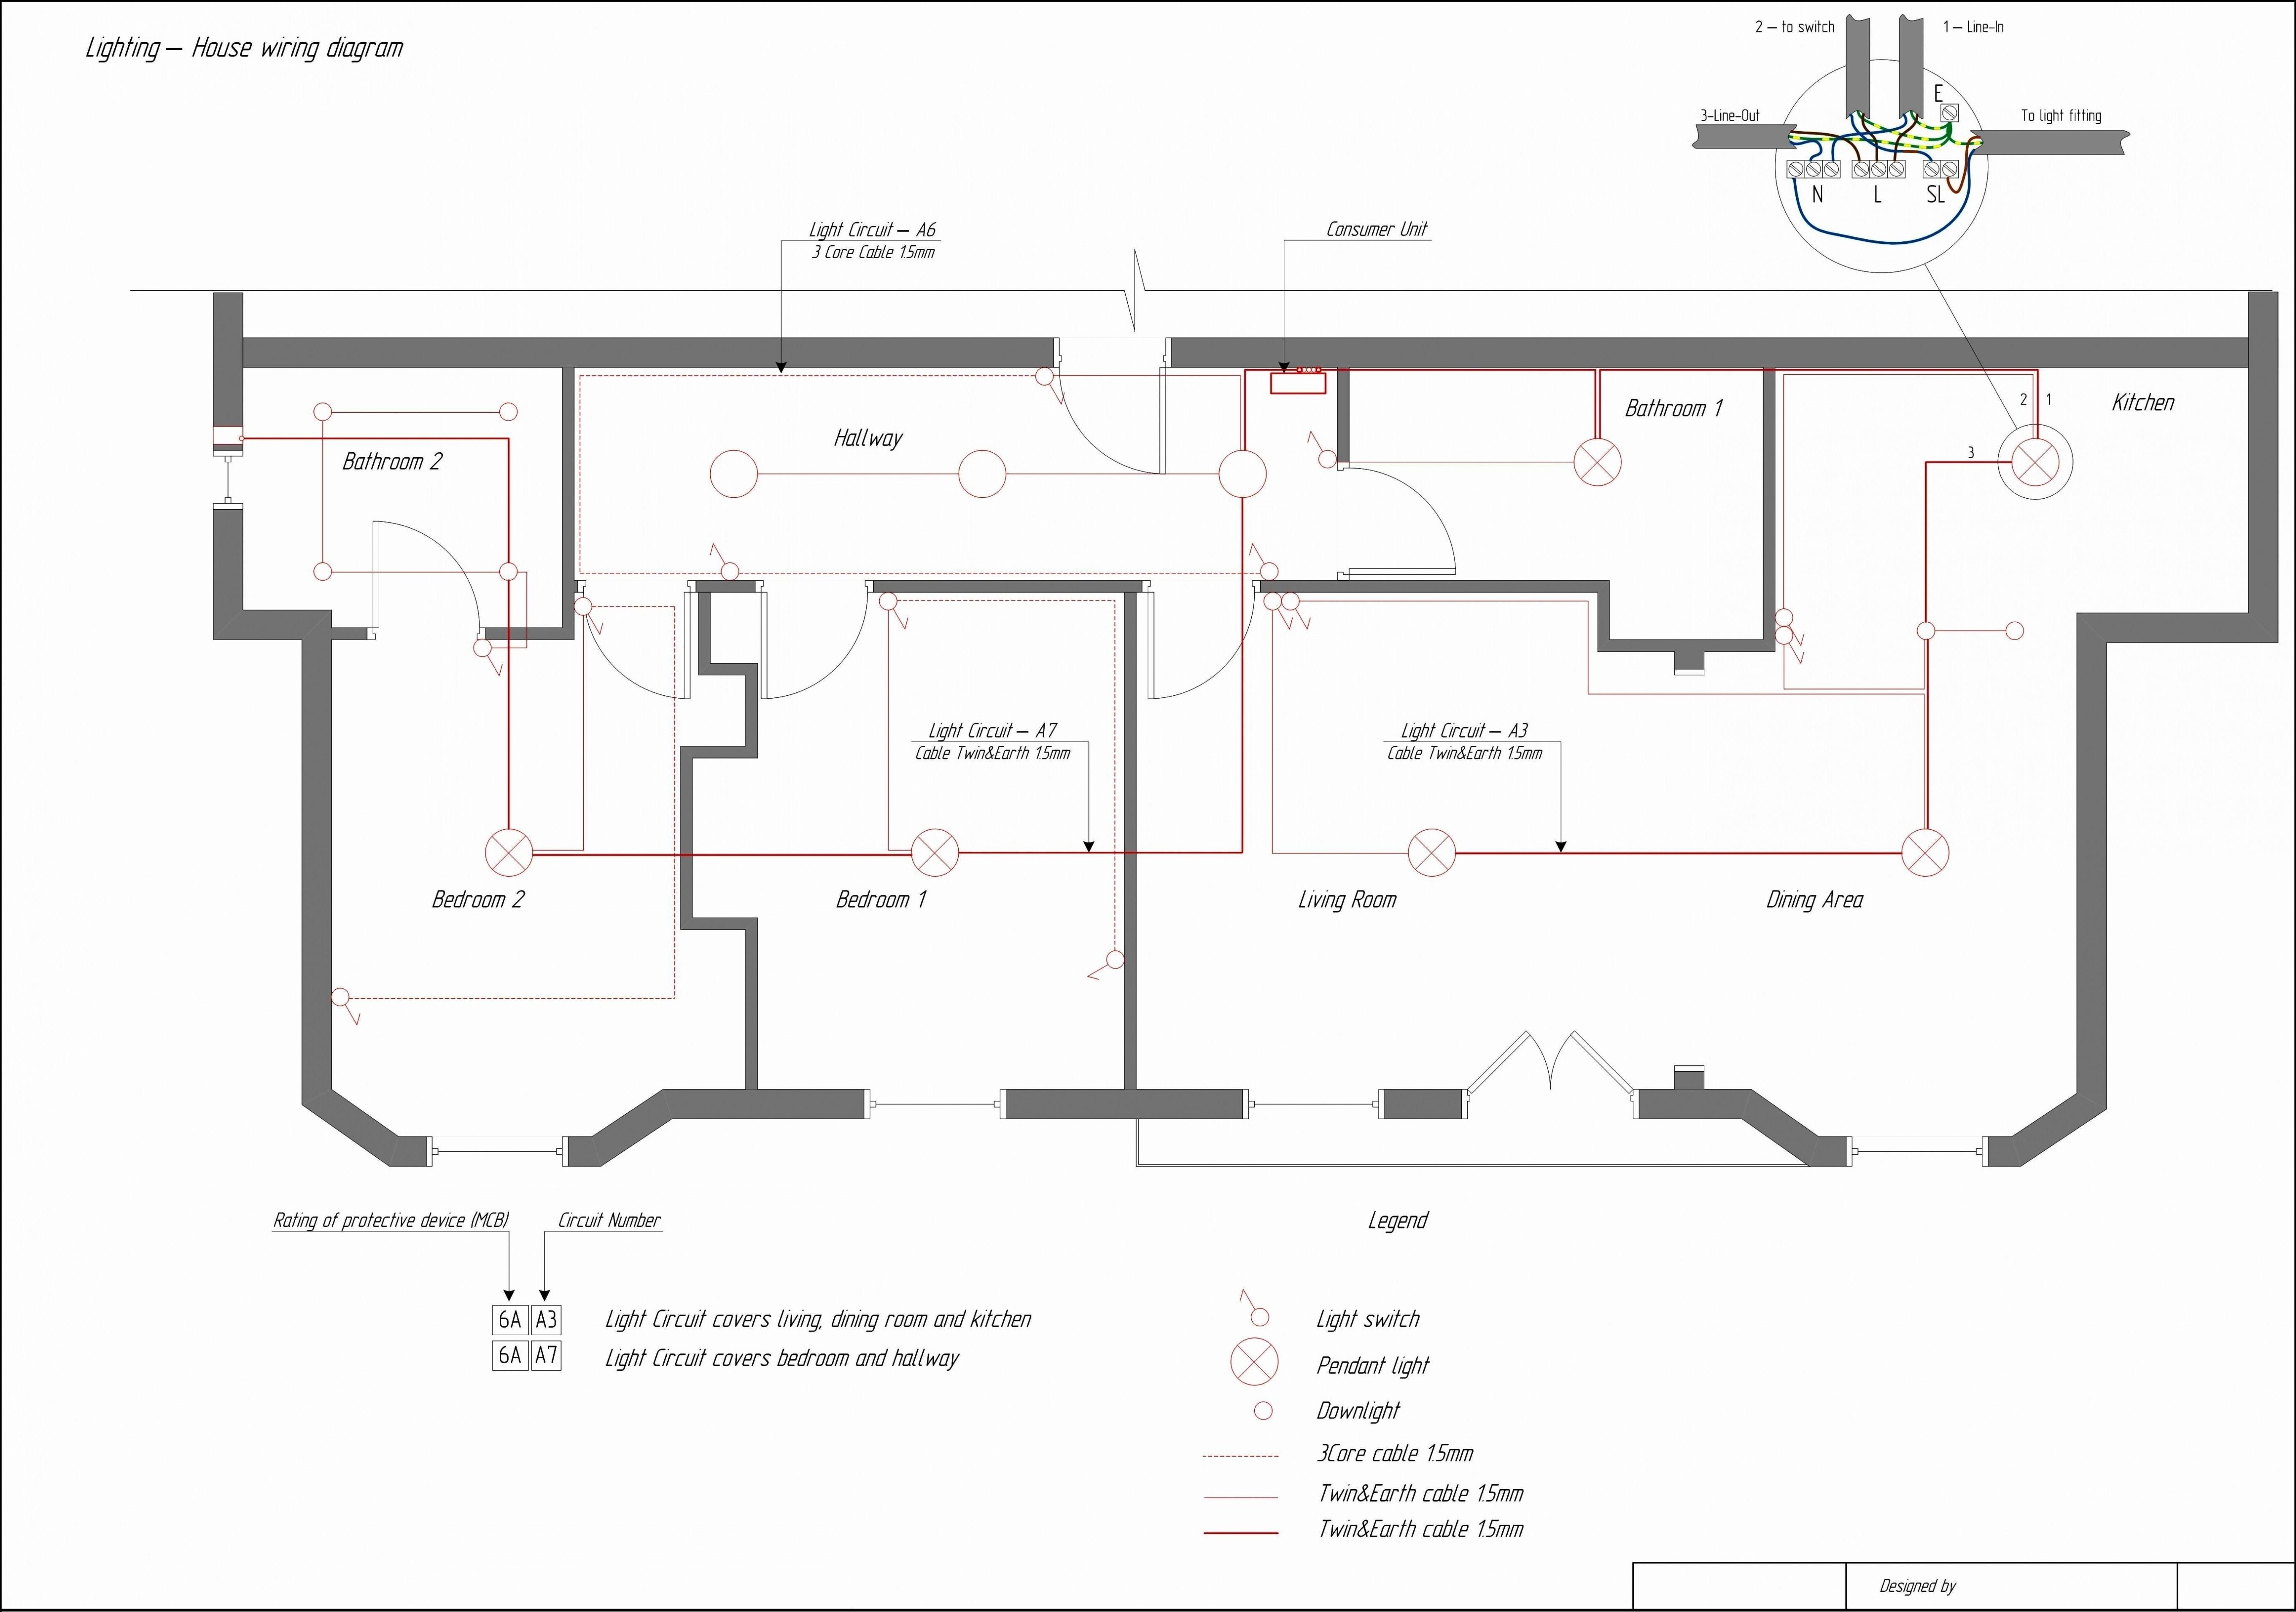 Nissan Altima Wiring Diagram M25 M26 | Wiring Diagram - Maestro Rr Wiring Diagram